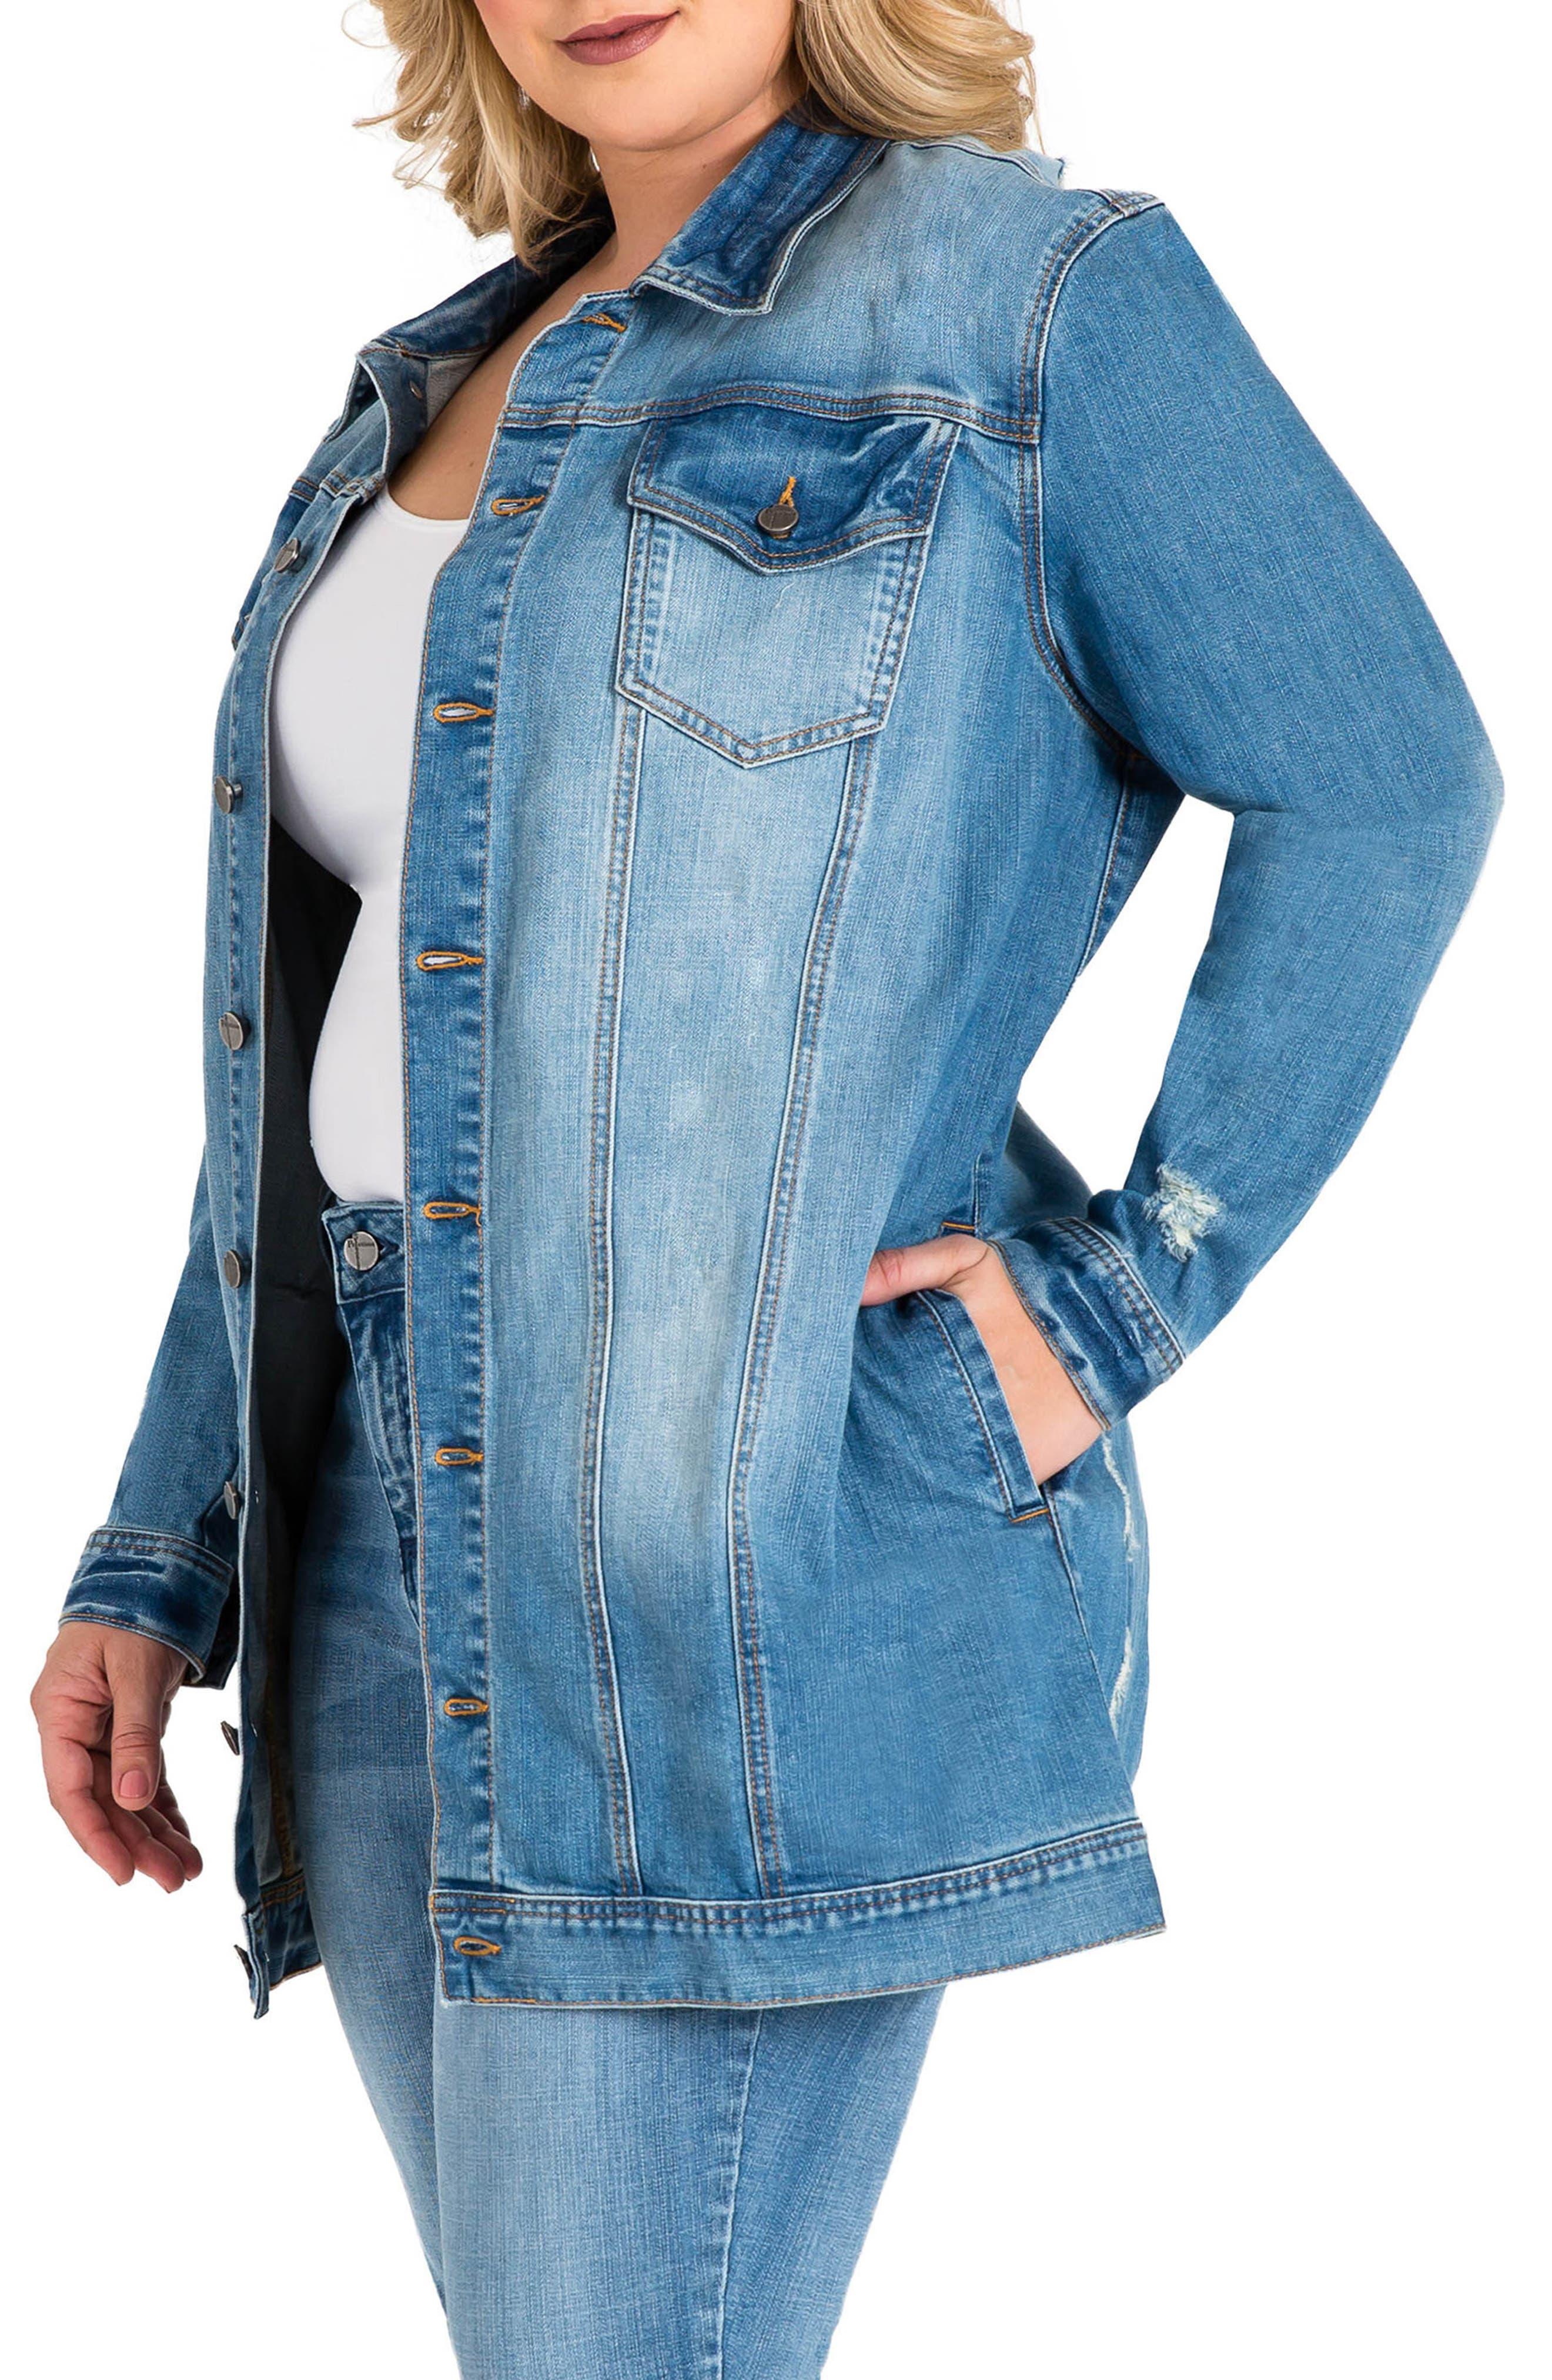 STANDARDS & PRACTICES, Margot Longline Denim Jacket, Alternate thumbnail 3, color, LIGHT BLUE